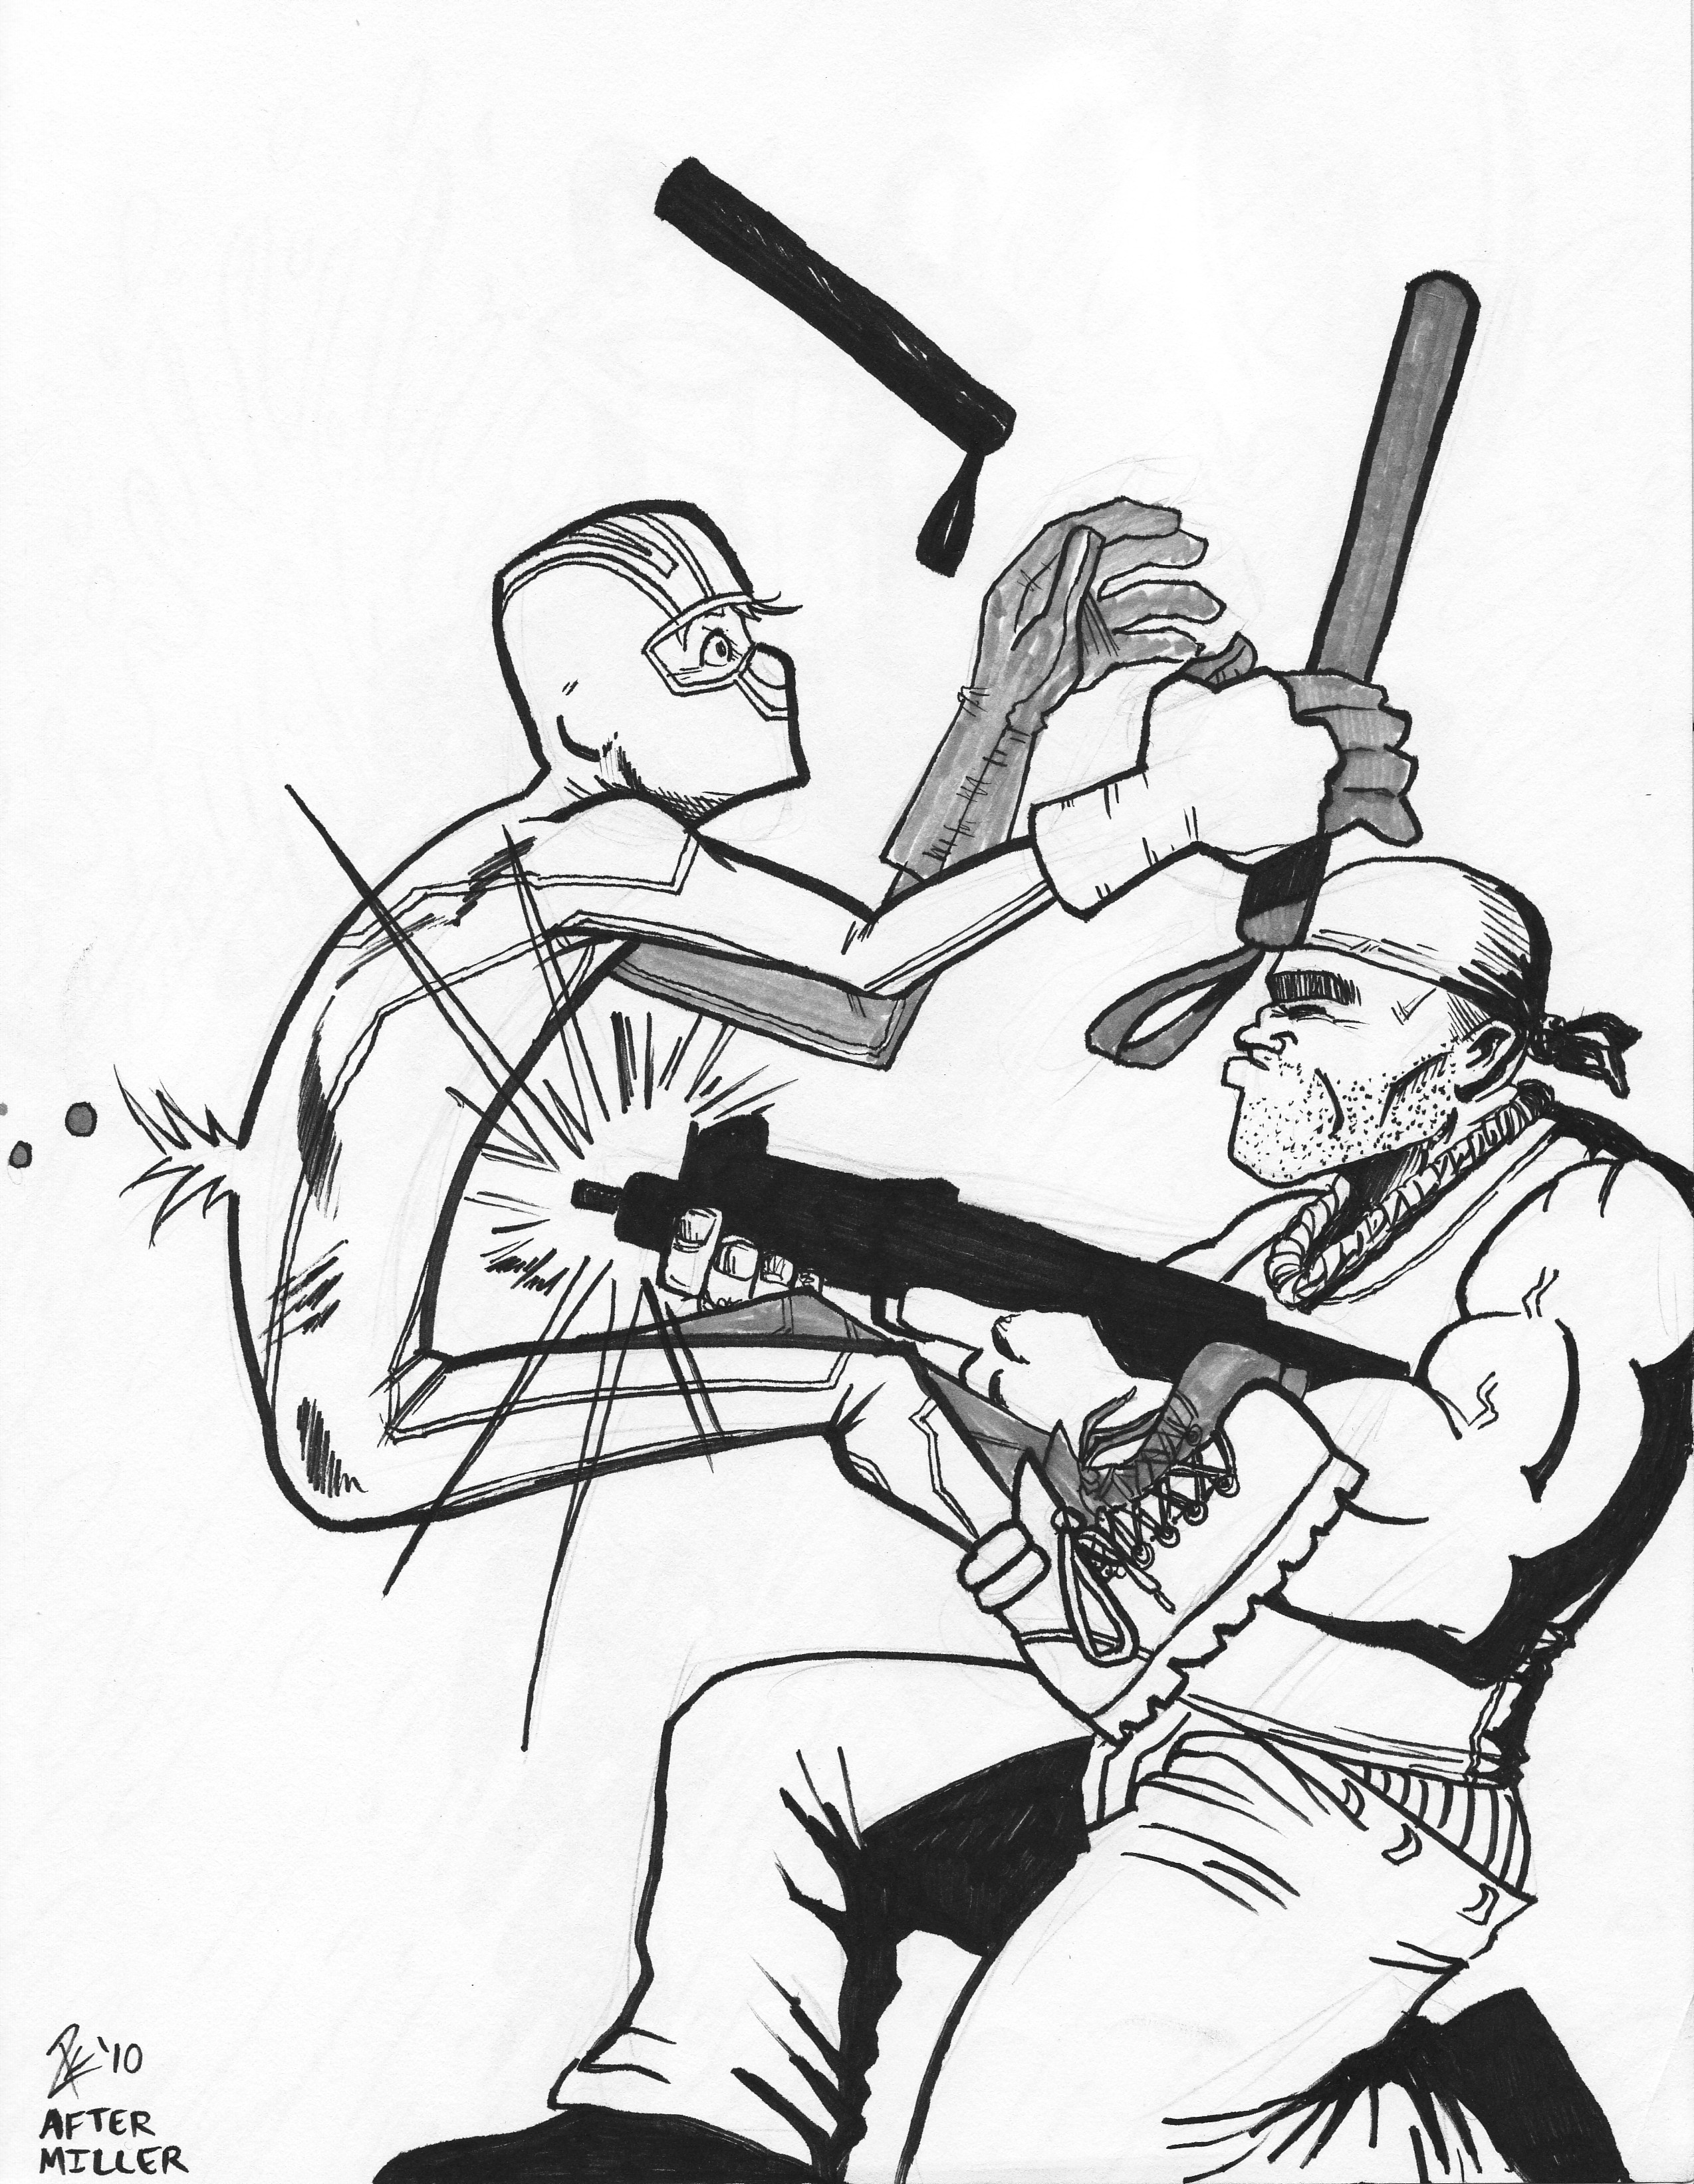 2548x3285 Kick Ass Homage To Daredevil 04.17.10 Ryan King